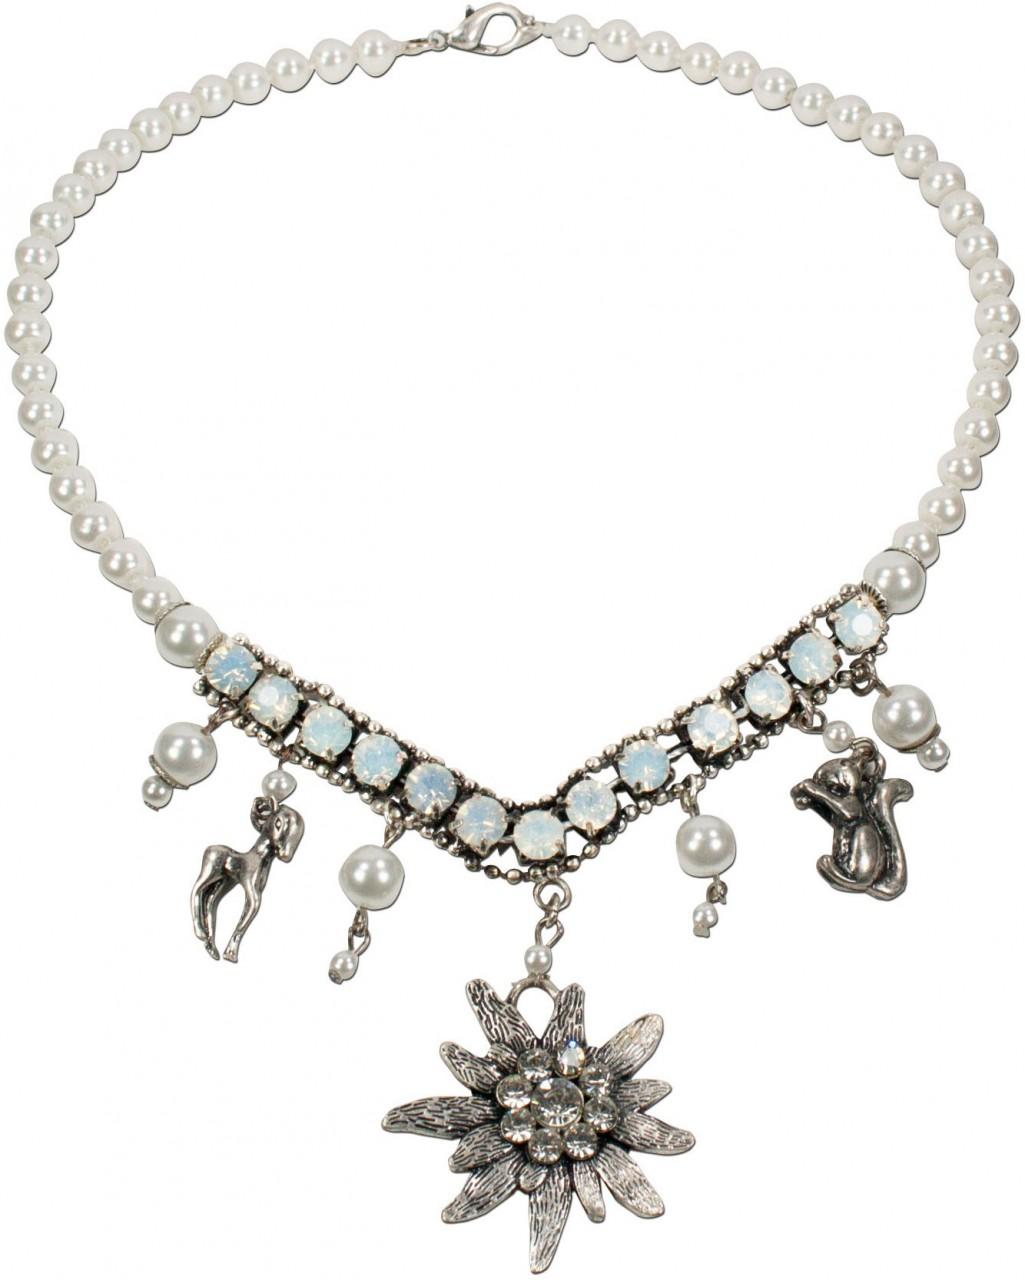 Perlenkette Hanne weiß